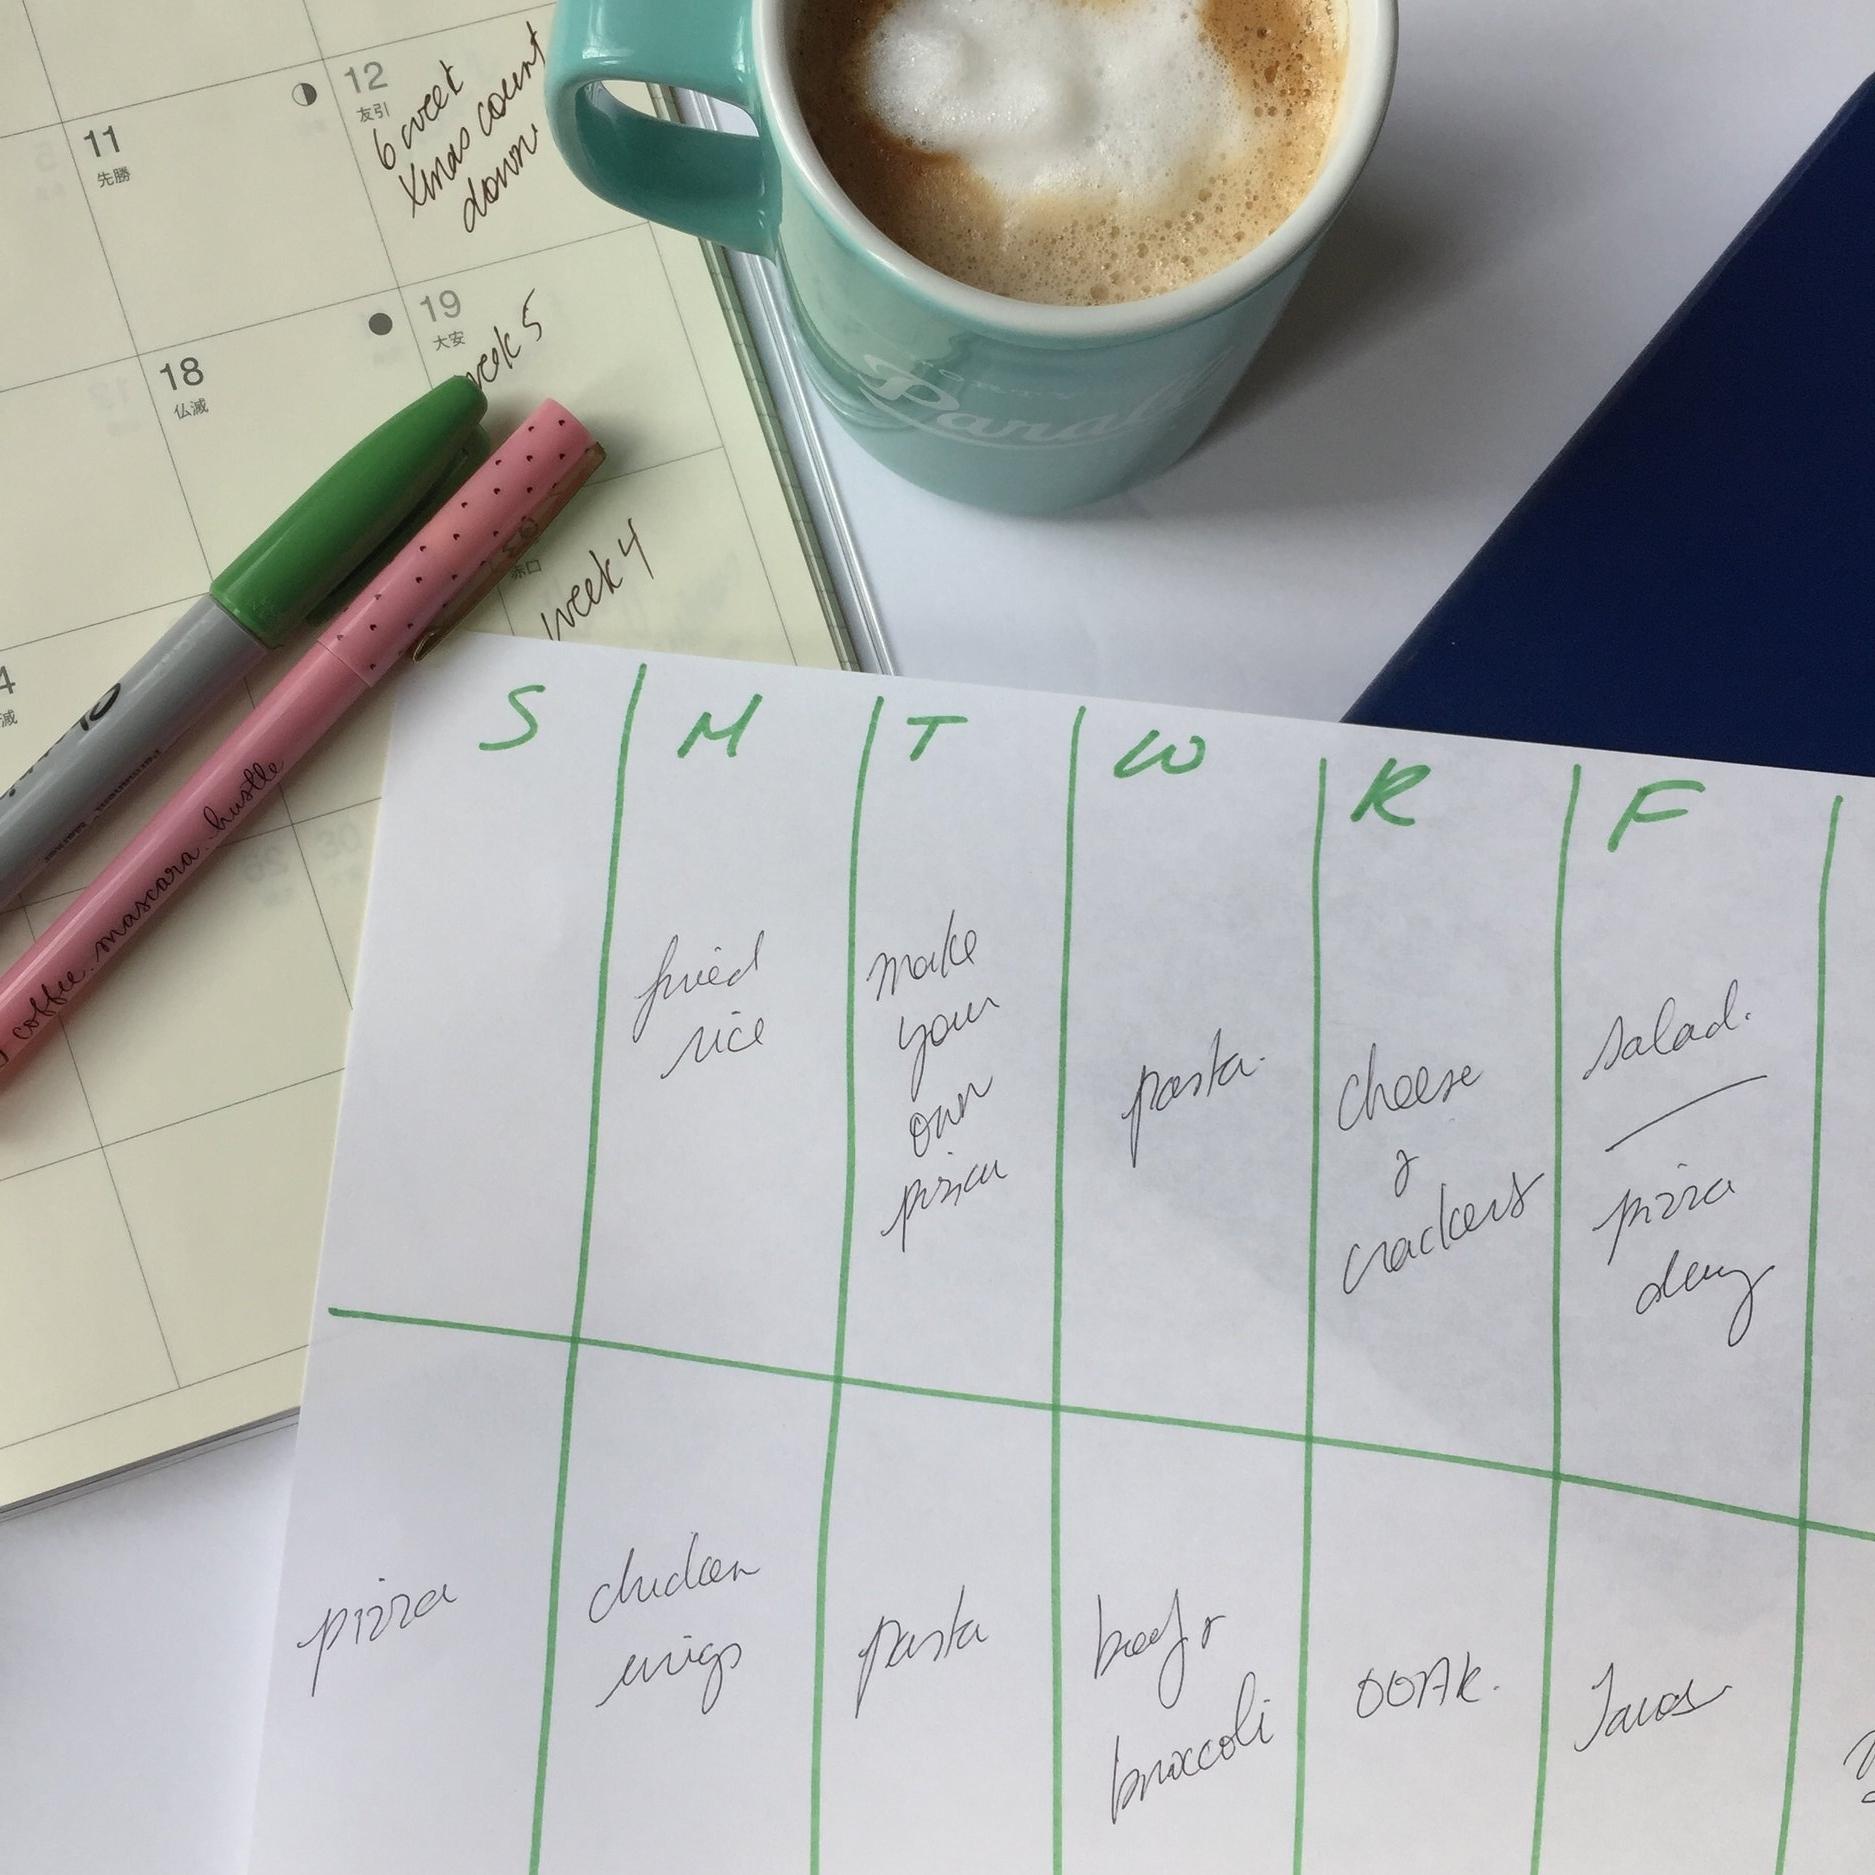 My simple hand sketched weekly meal plan.